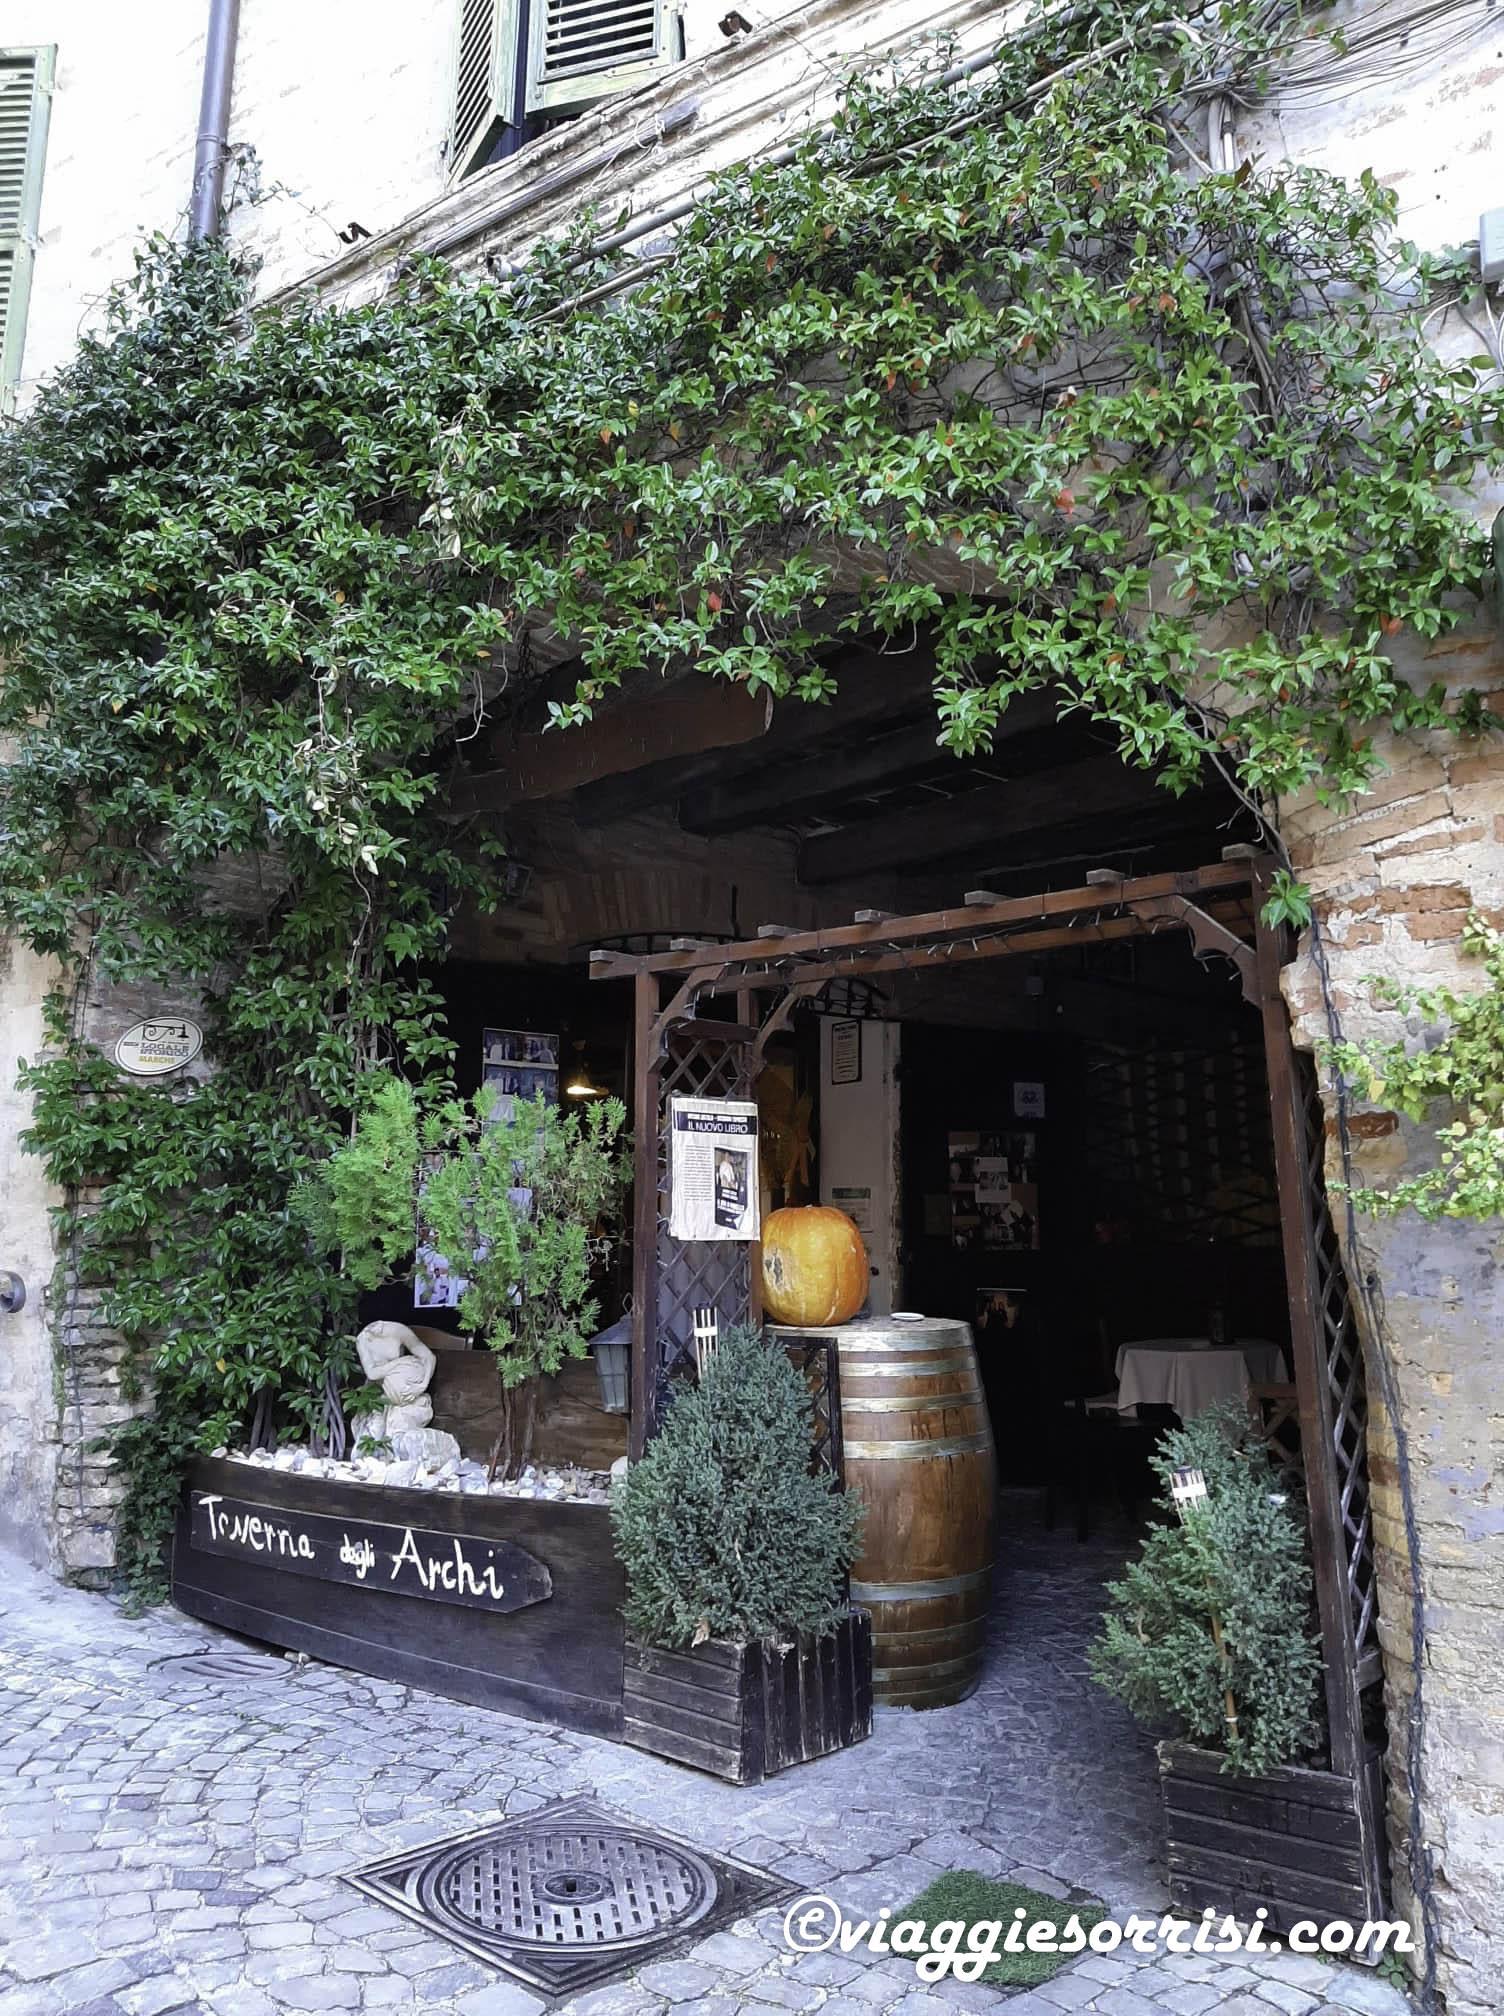 La Taverna degli Archi